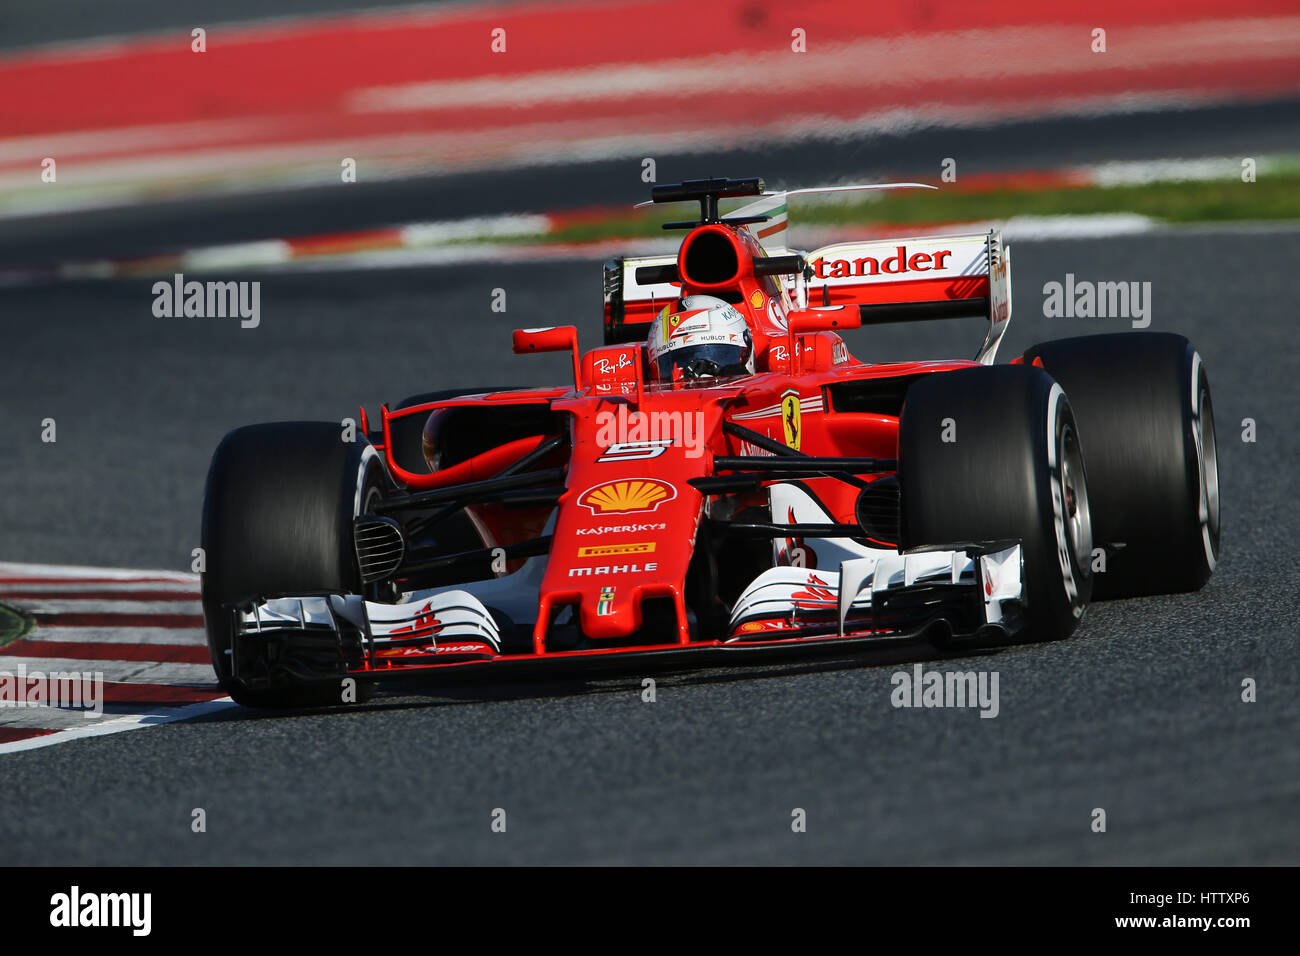 Sebastian Vettel Ger Driving His Scuderia Ferrari Sf70h During The Stock Photo Alamy